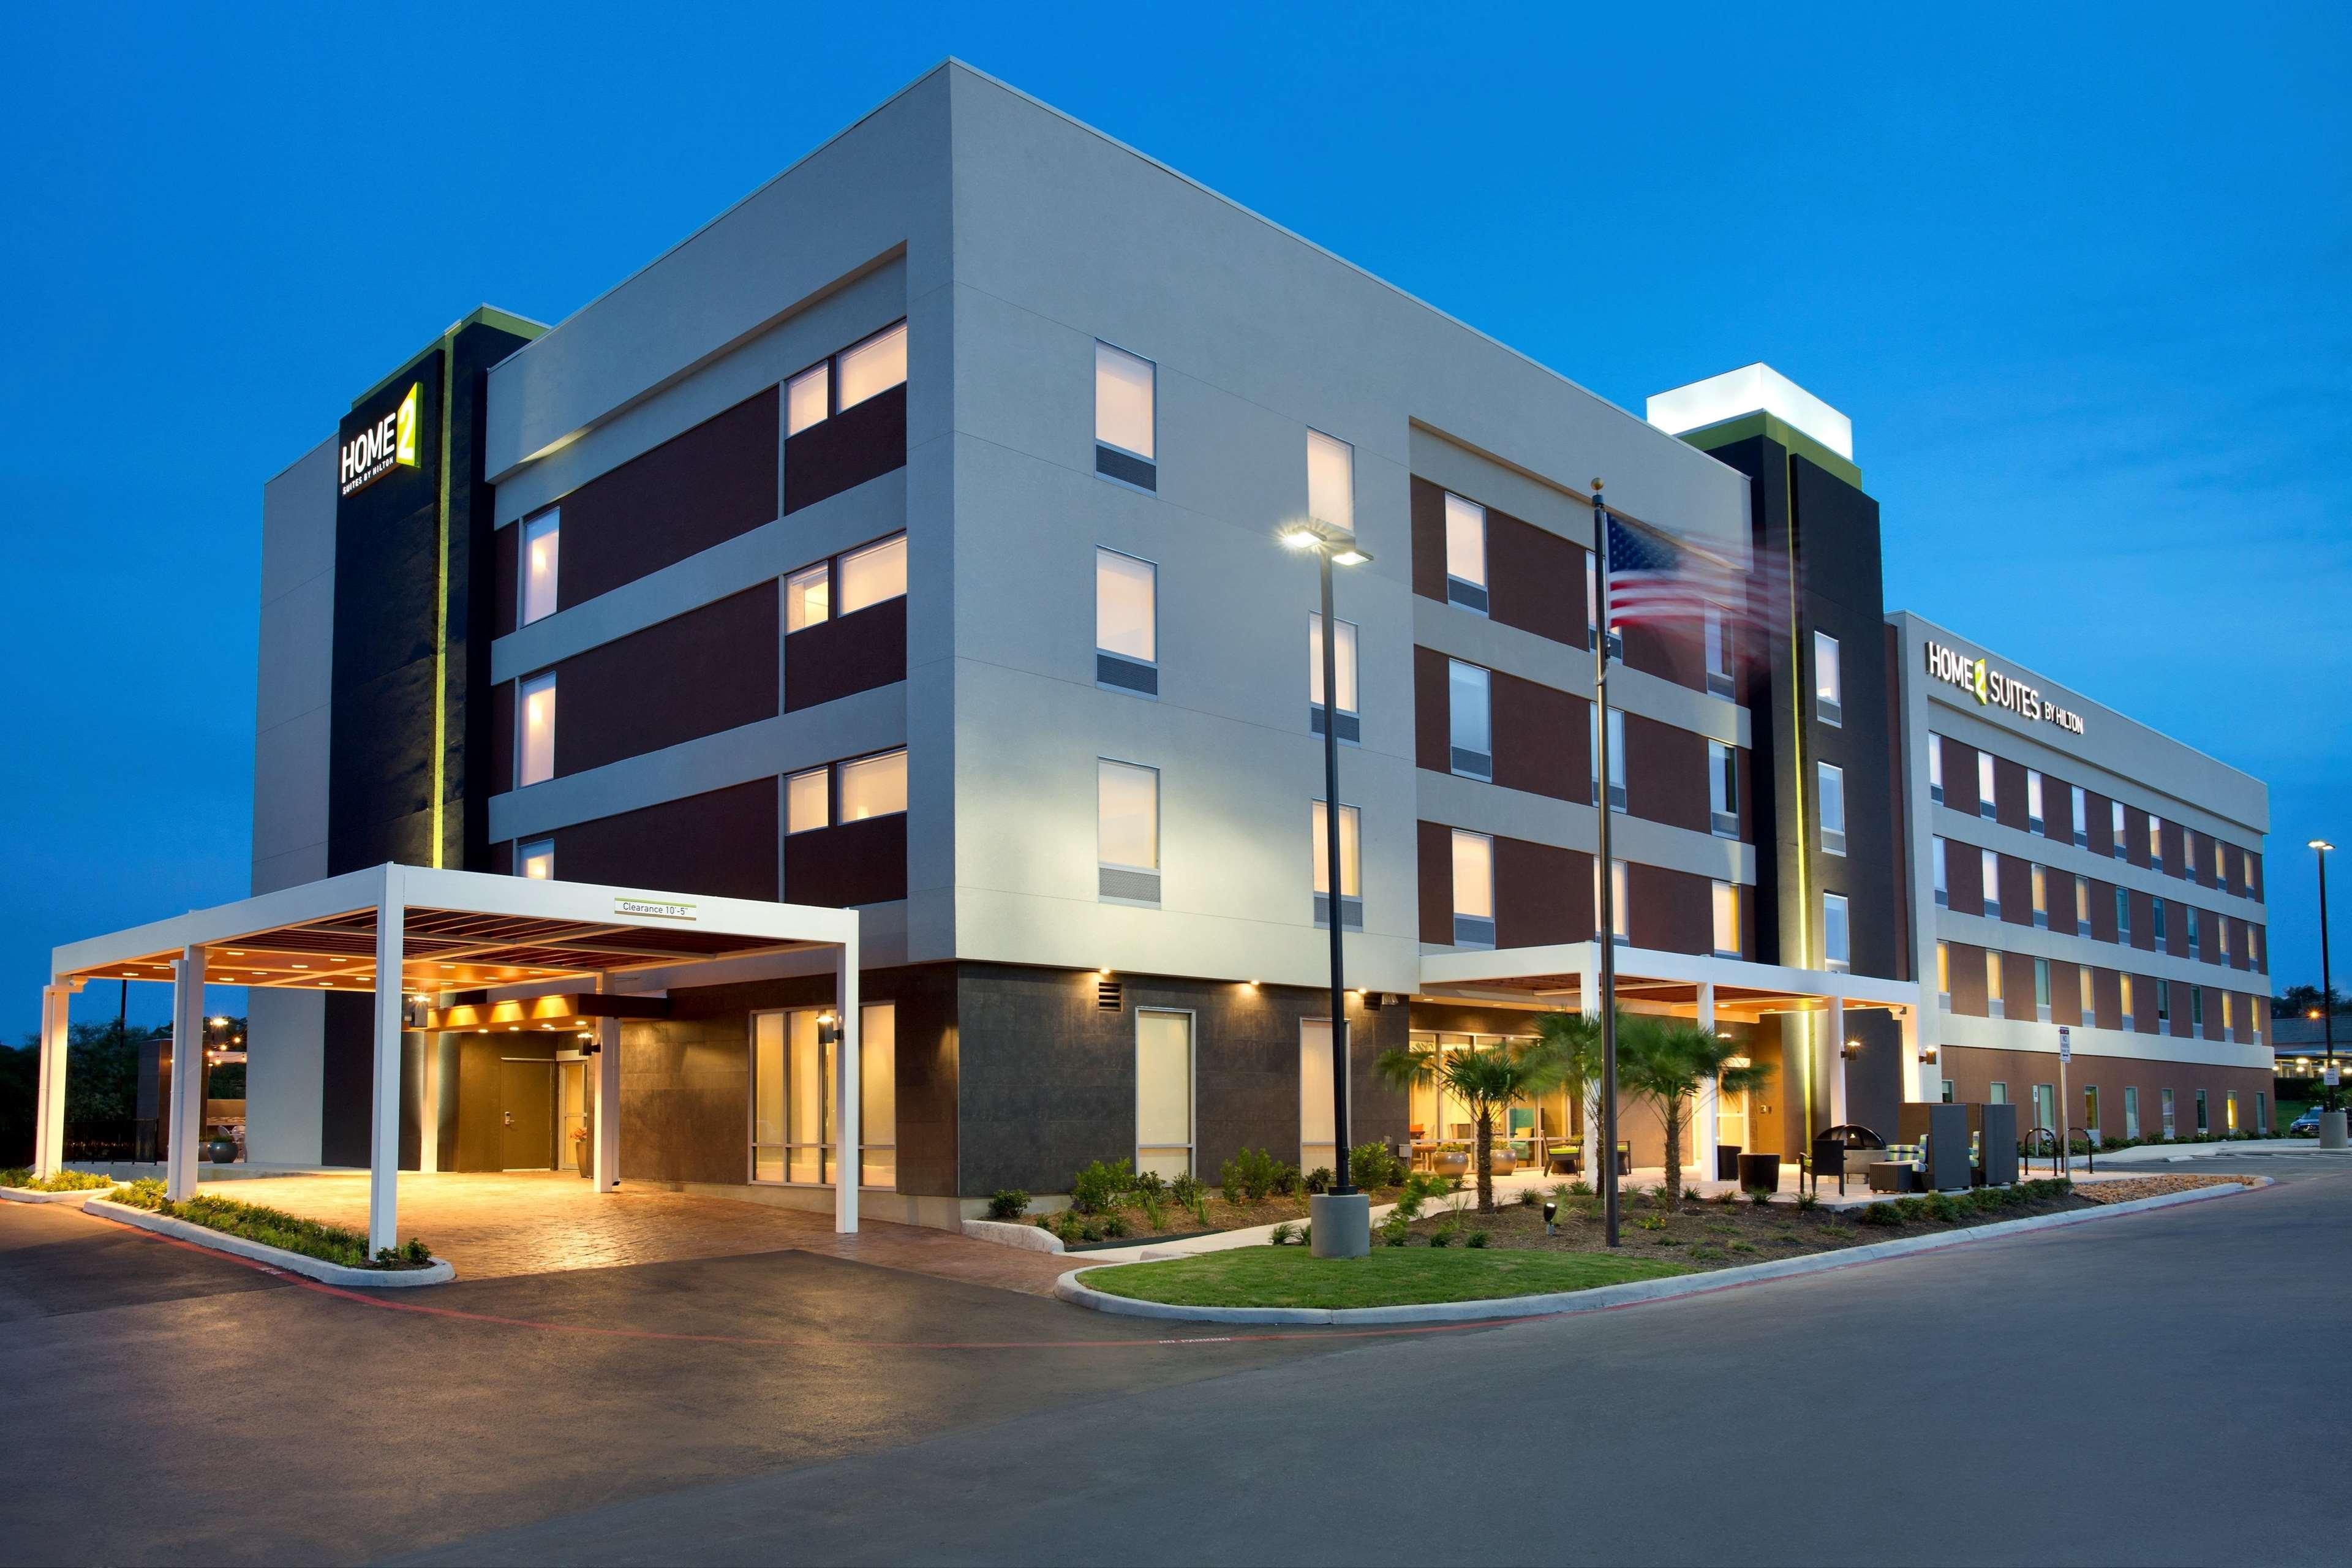 Home2 Suites by Hilton San Antonio Airport, TX image 2